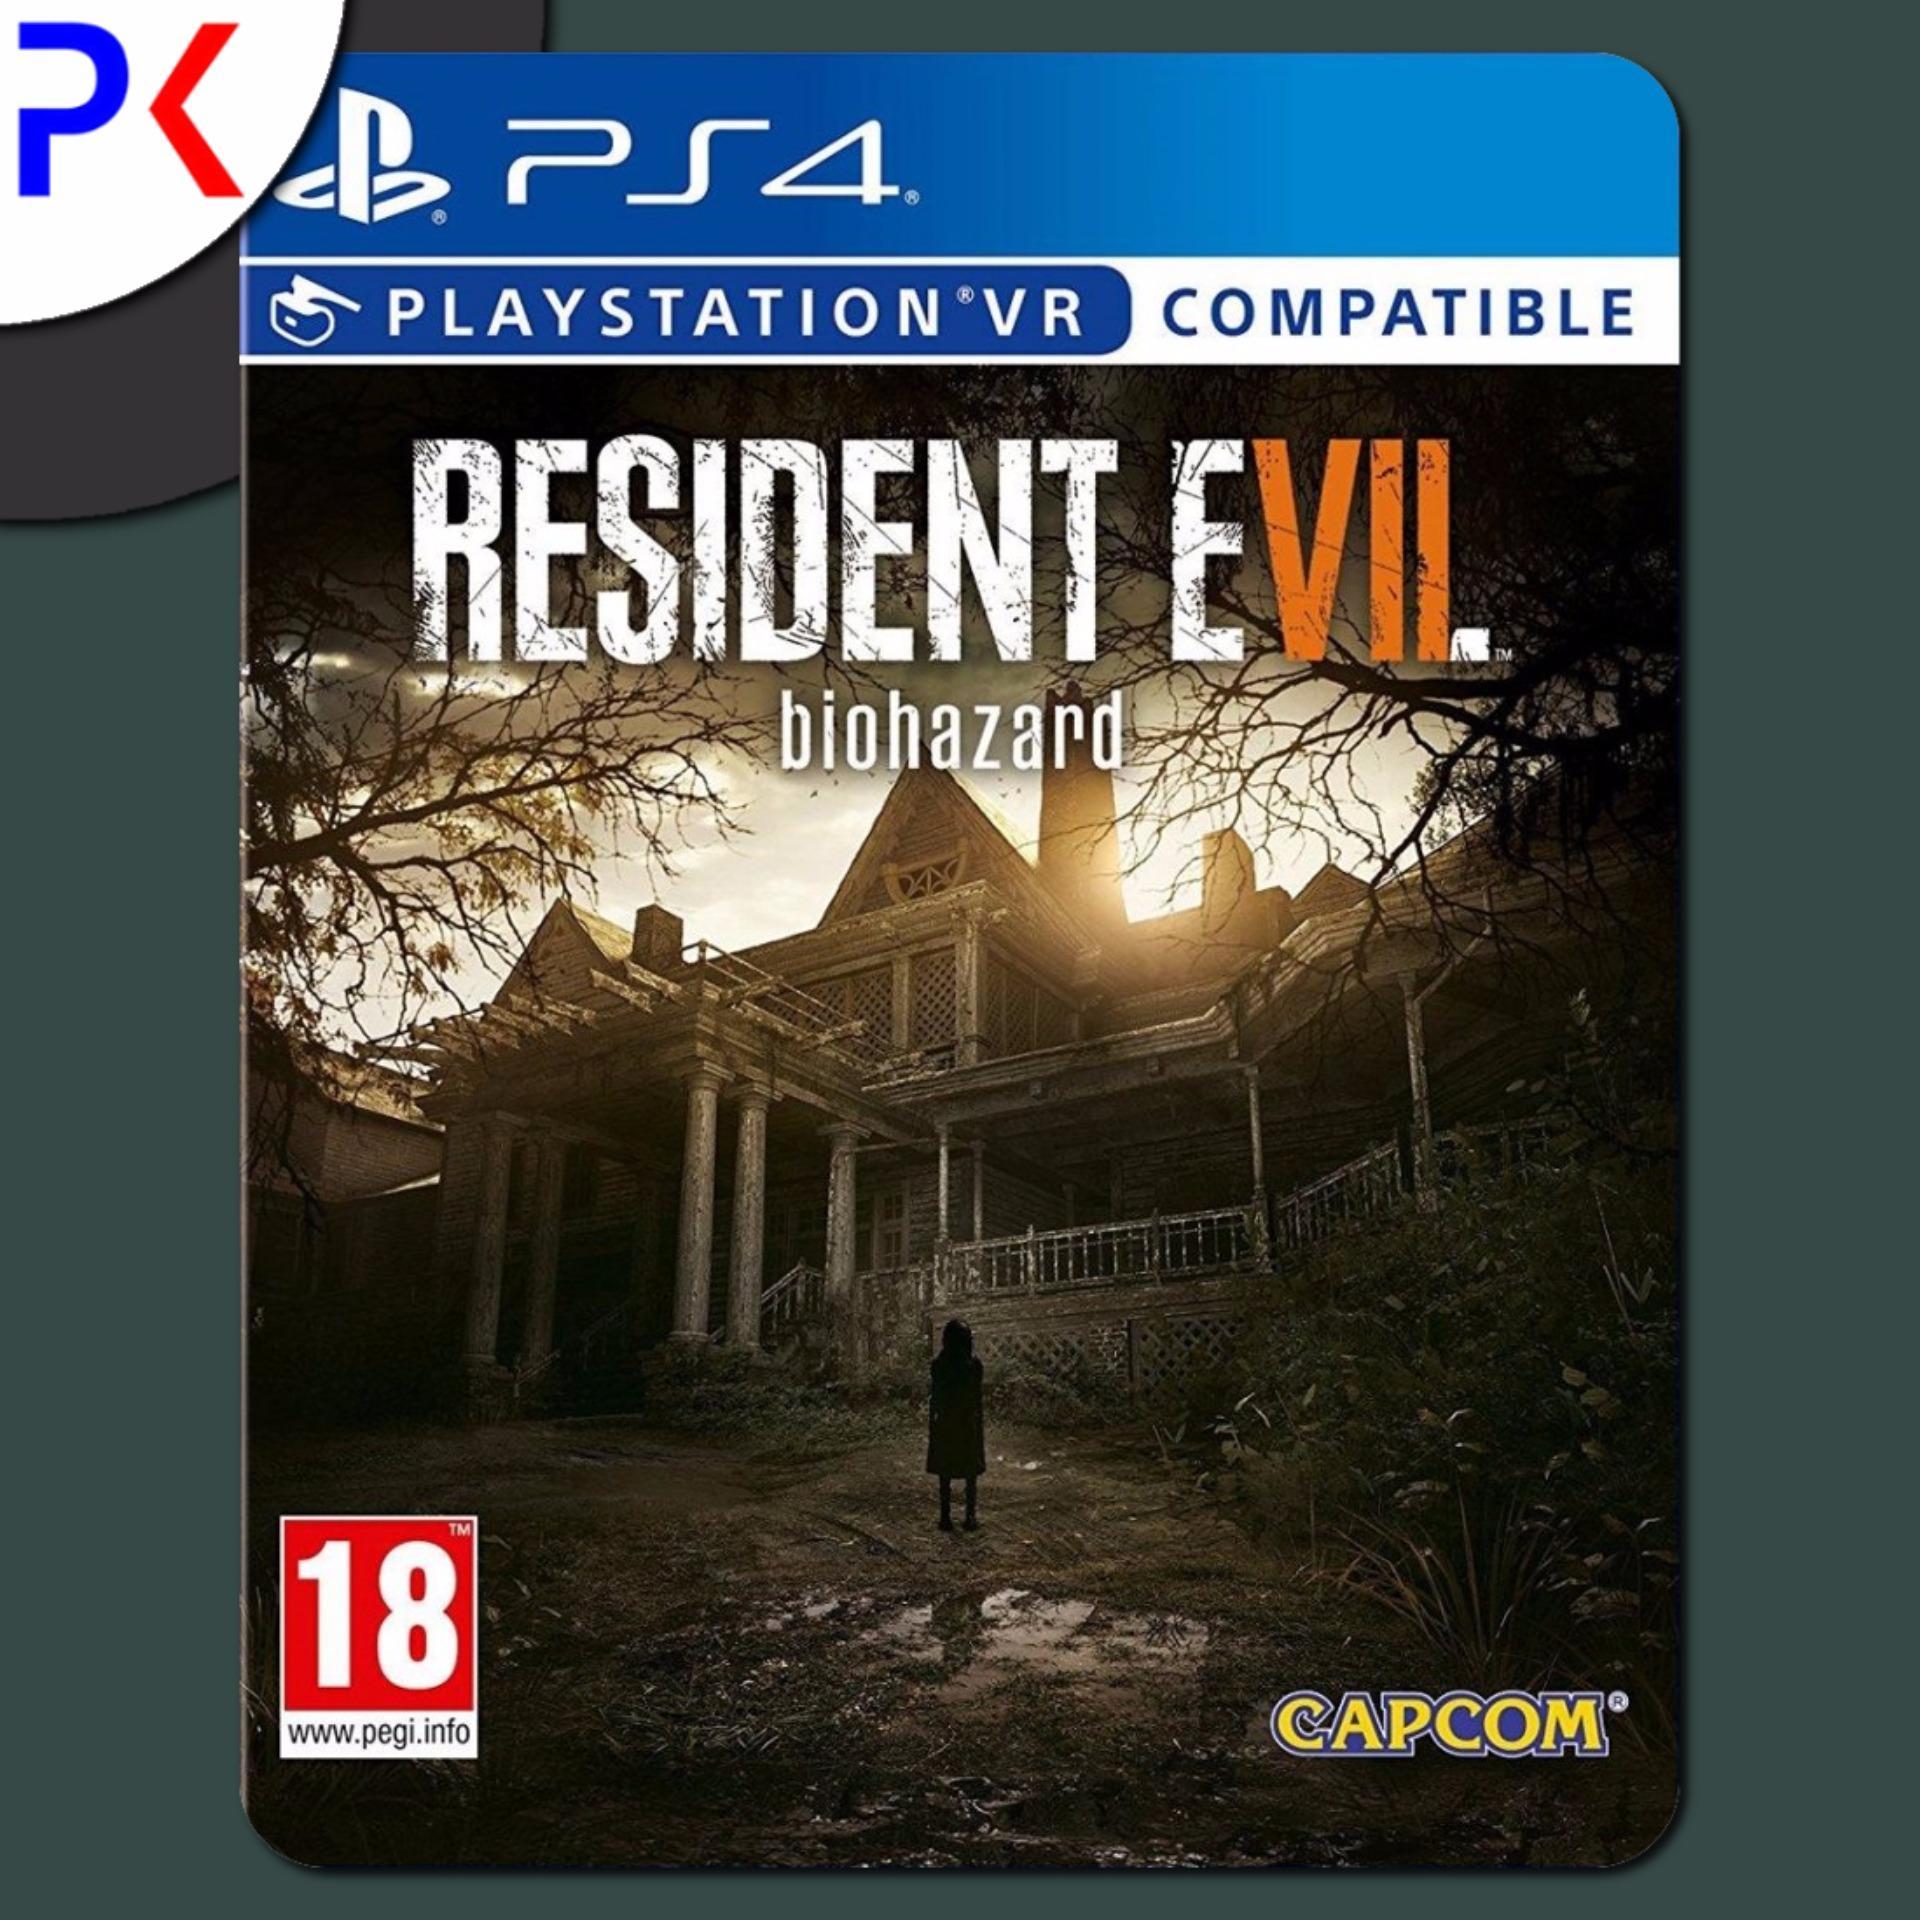 PS4 Resident Evil 7: biohazard (R2)